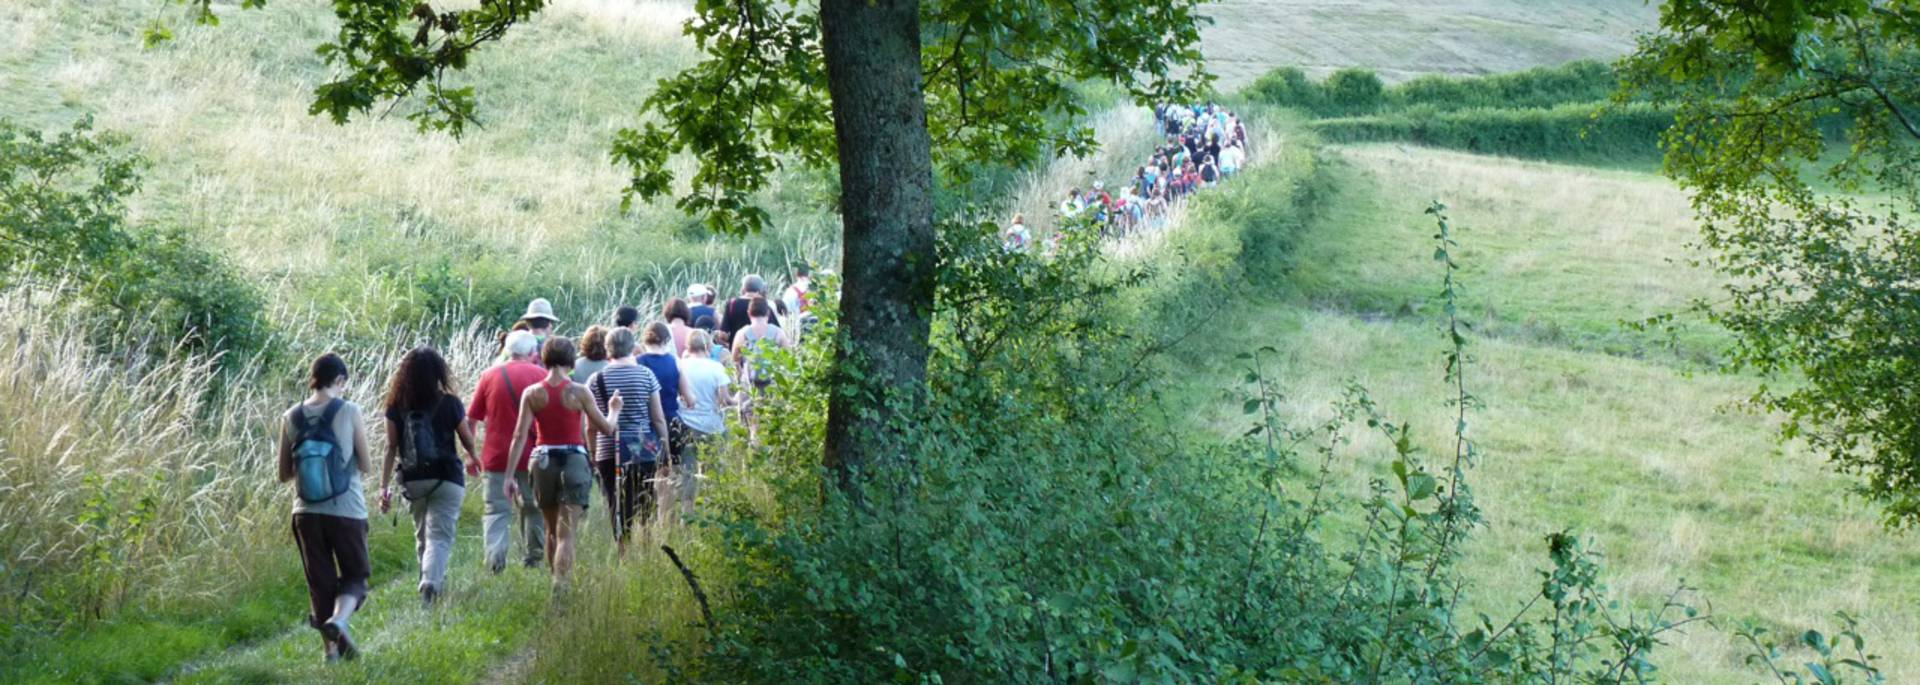 Randonnées à Saint-Sernin-du-Bois. © Gilbert Brochot.